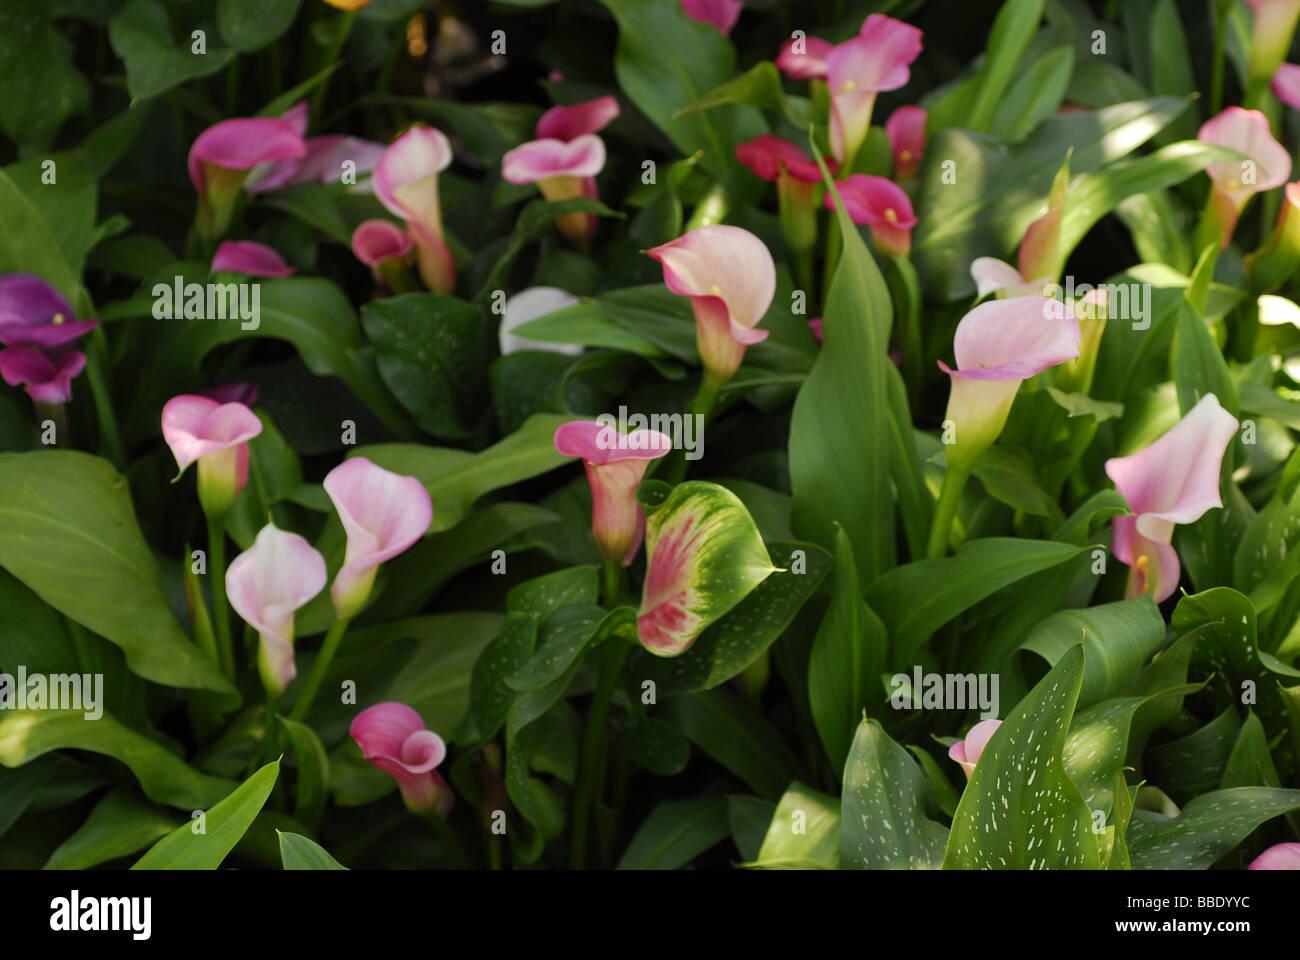 Zantedeschia aethiopica, calla, Araceae, South Africa - Stock Image